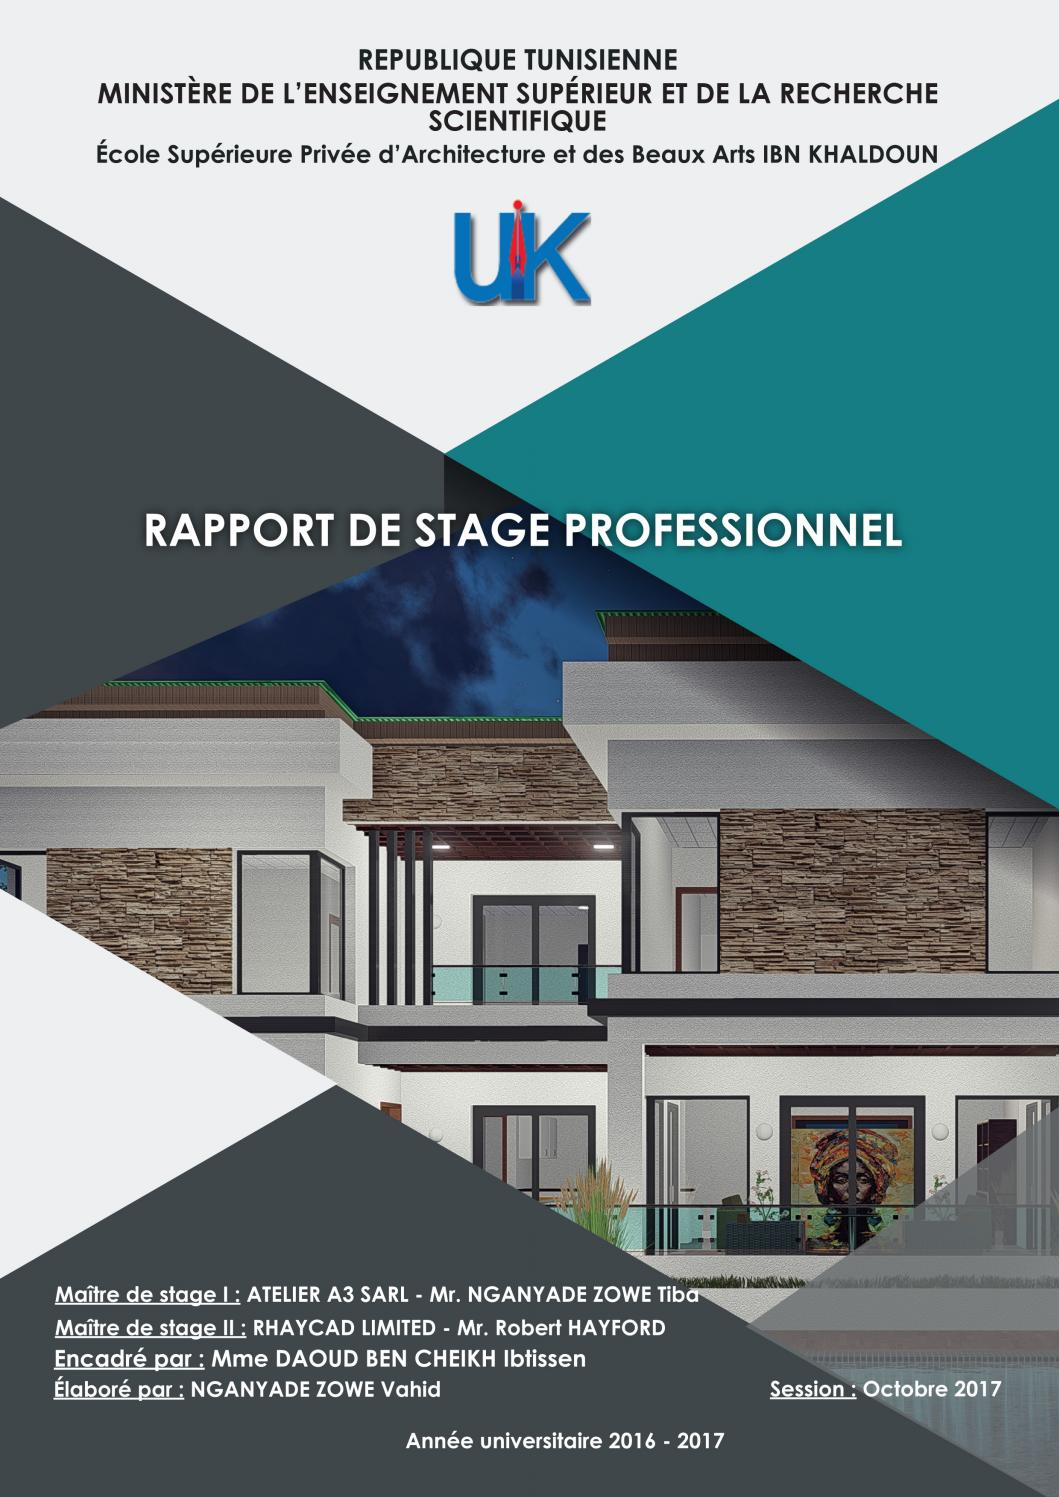 Bureau D Étude Béton Marseille rapport de stage professionnelvahid zowe - issuu